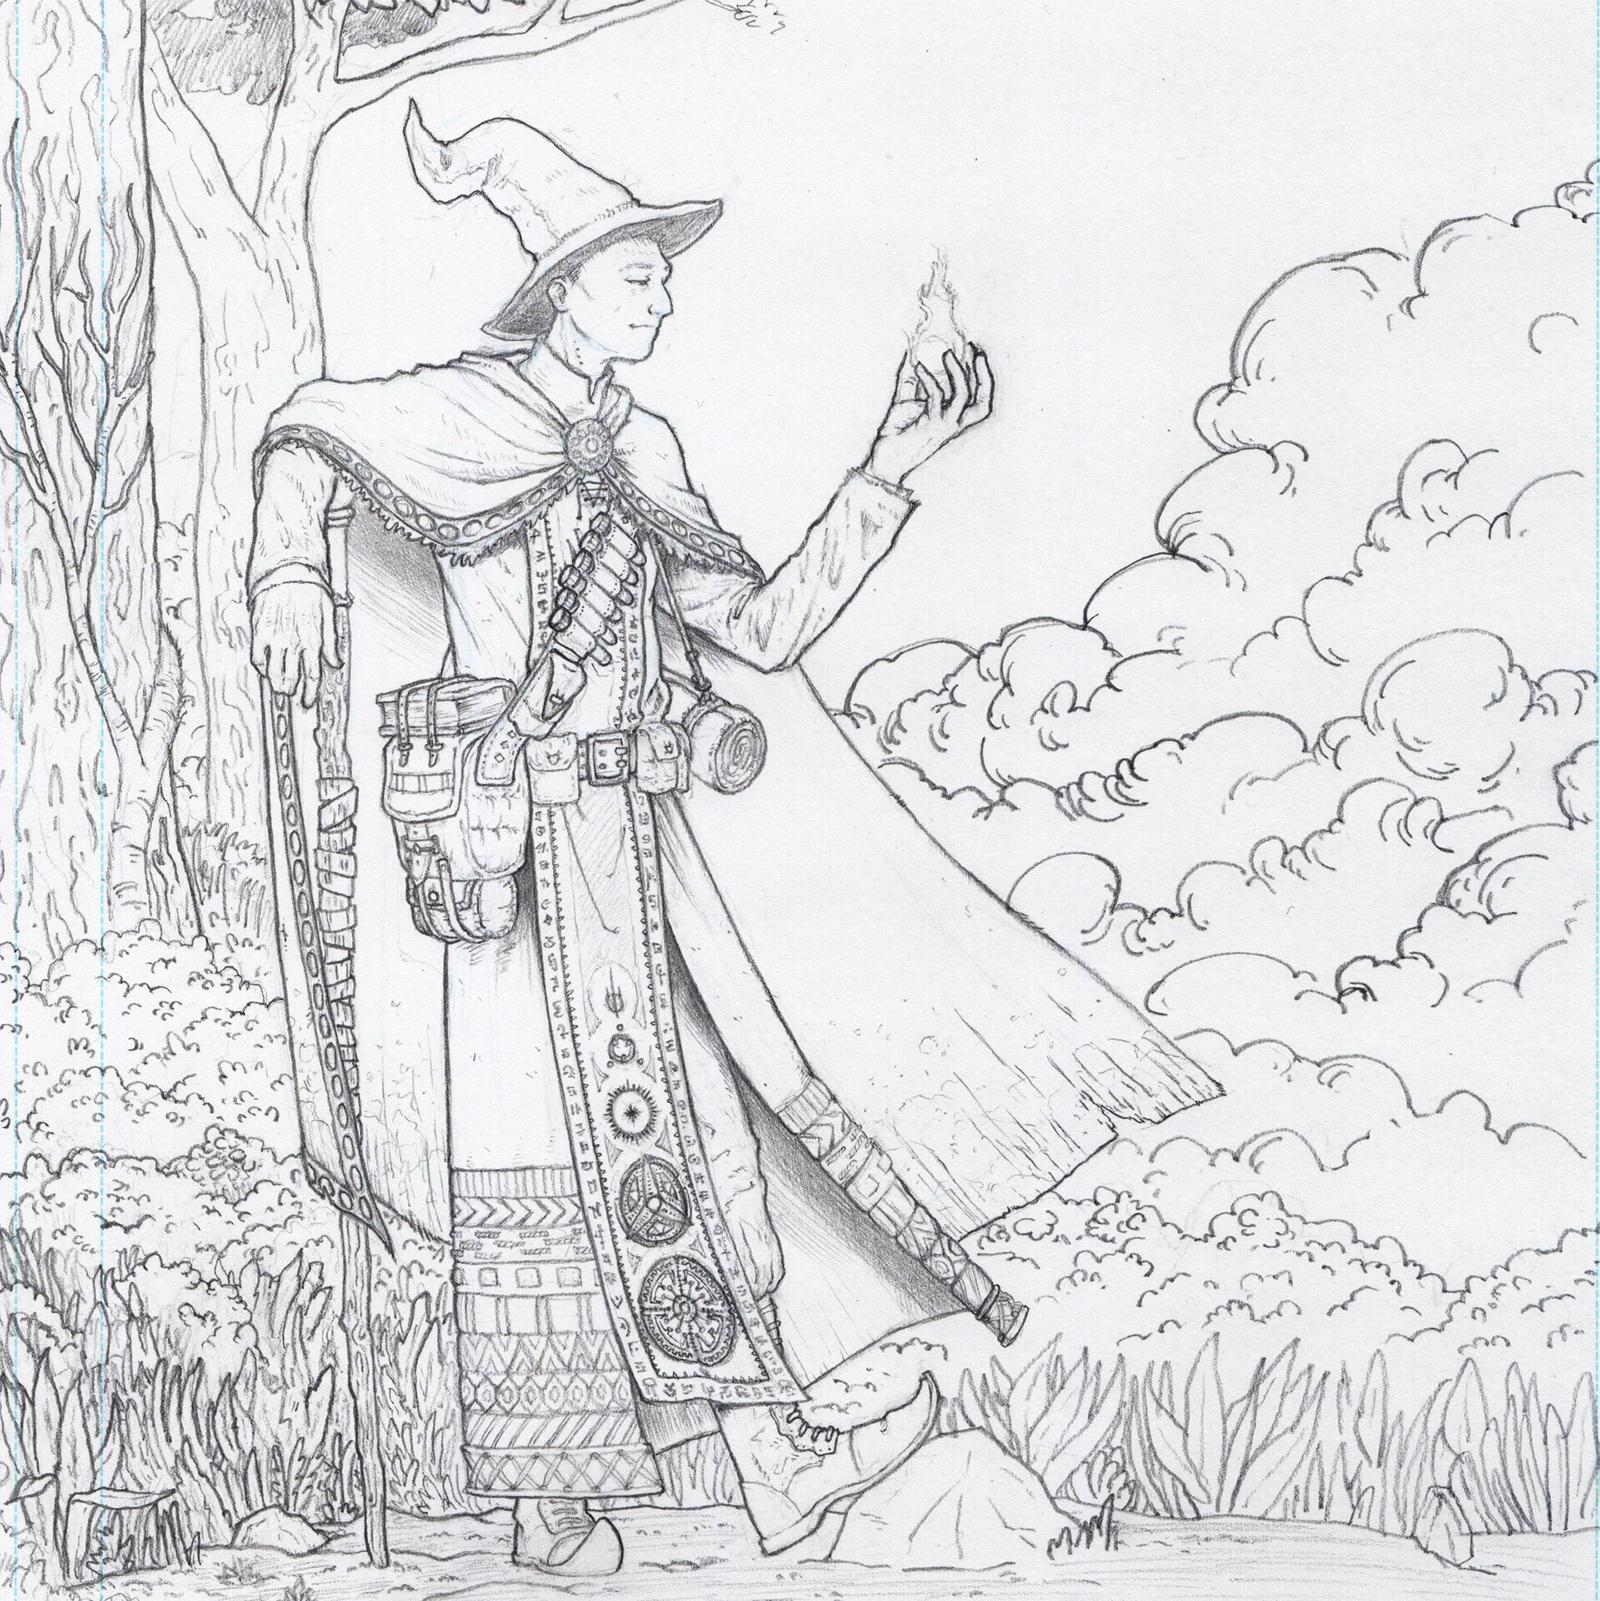 'Wizard'